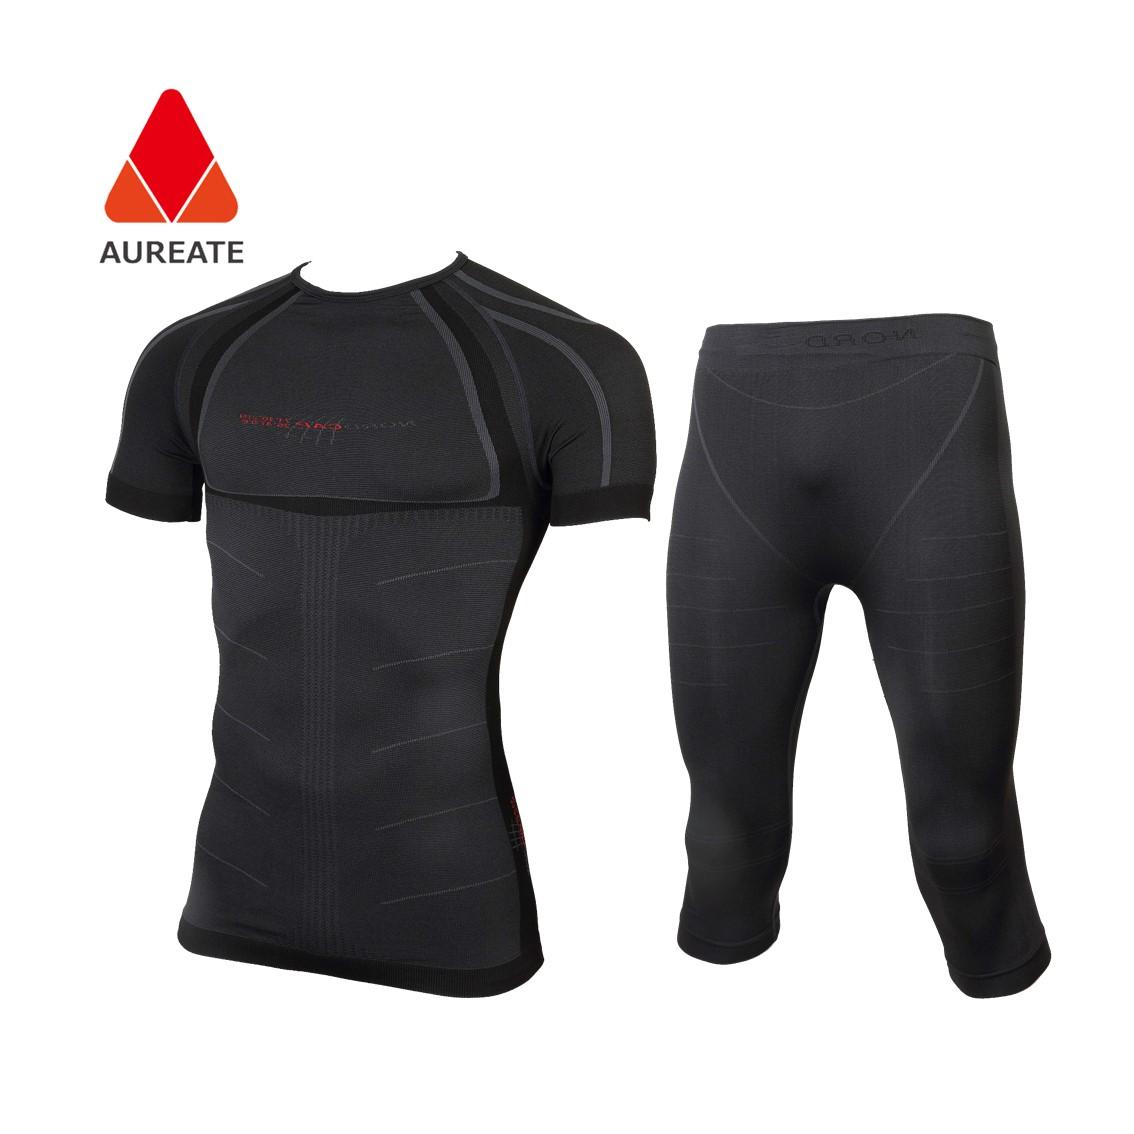 Seamless Thermal underwear long johns long sleeve t shirts orange family tight longsleeve matching men thermal underwear